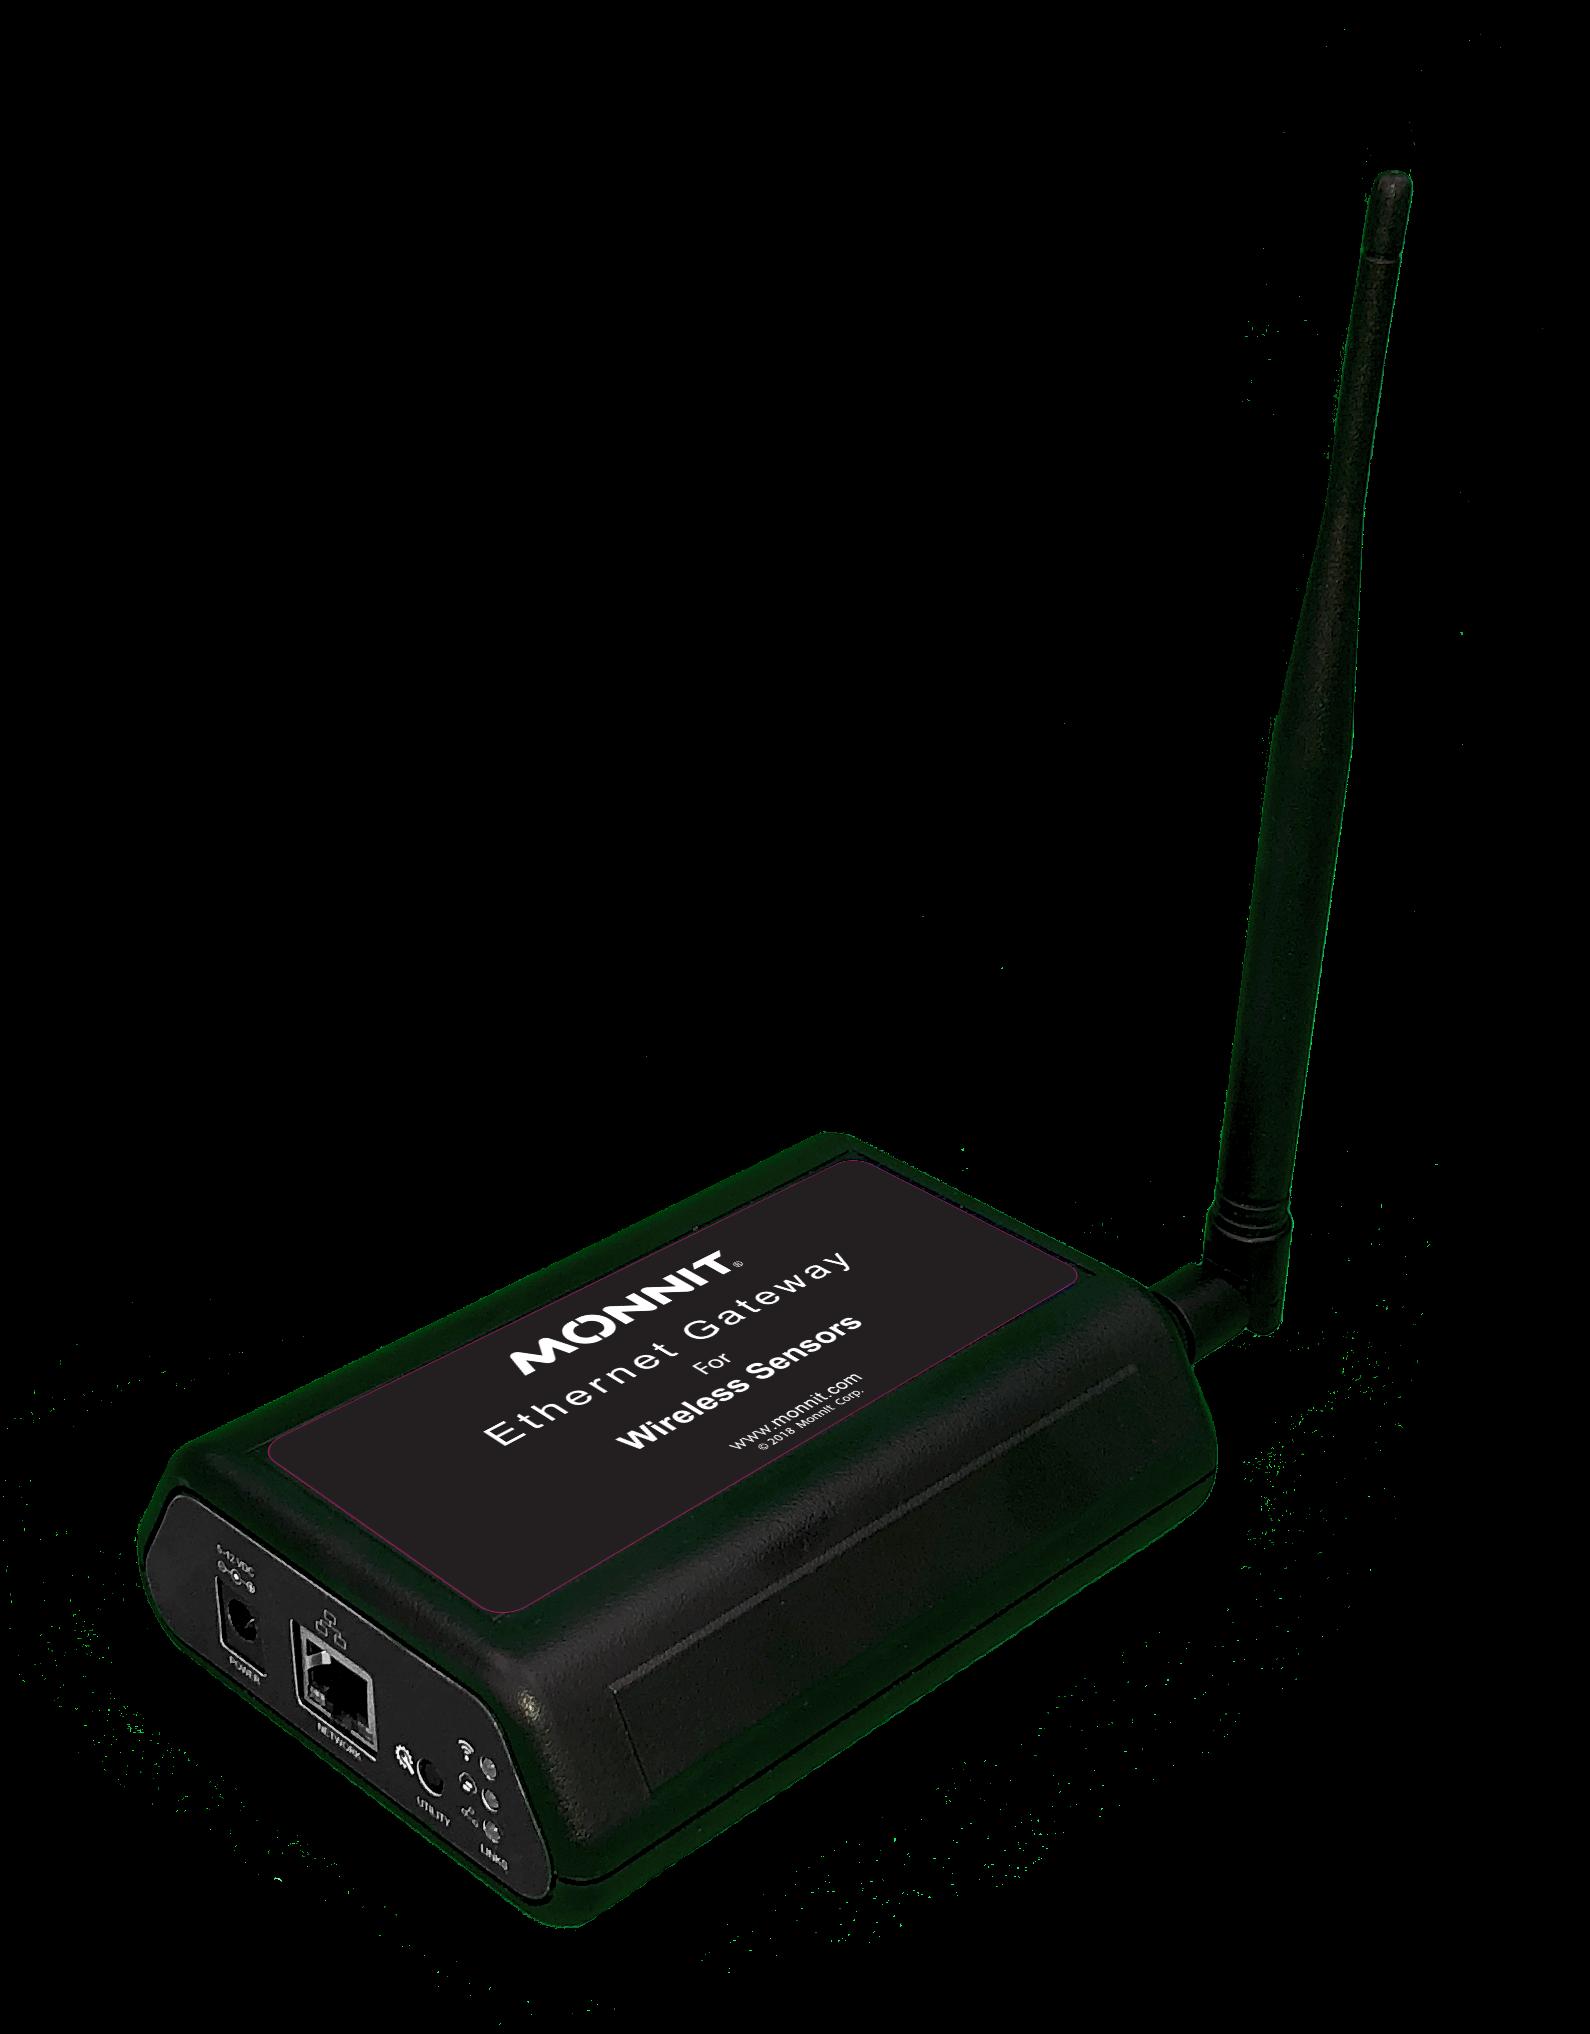 Monnit Ethernet Gateway 4